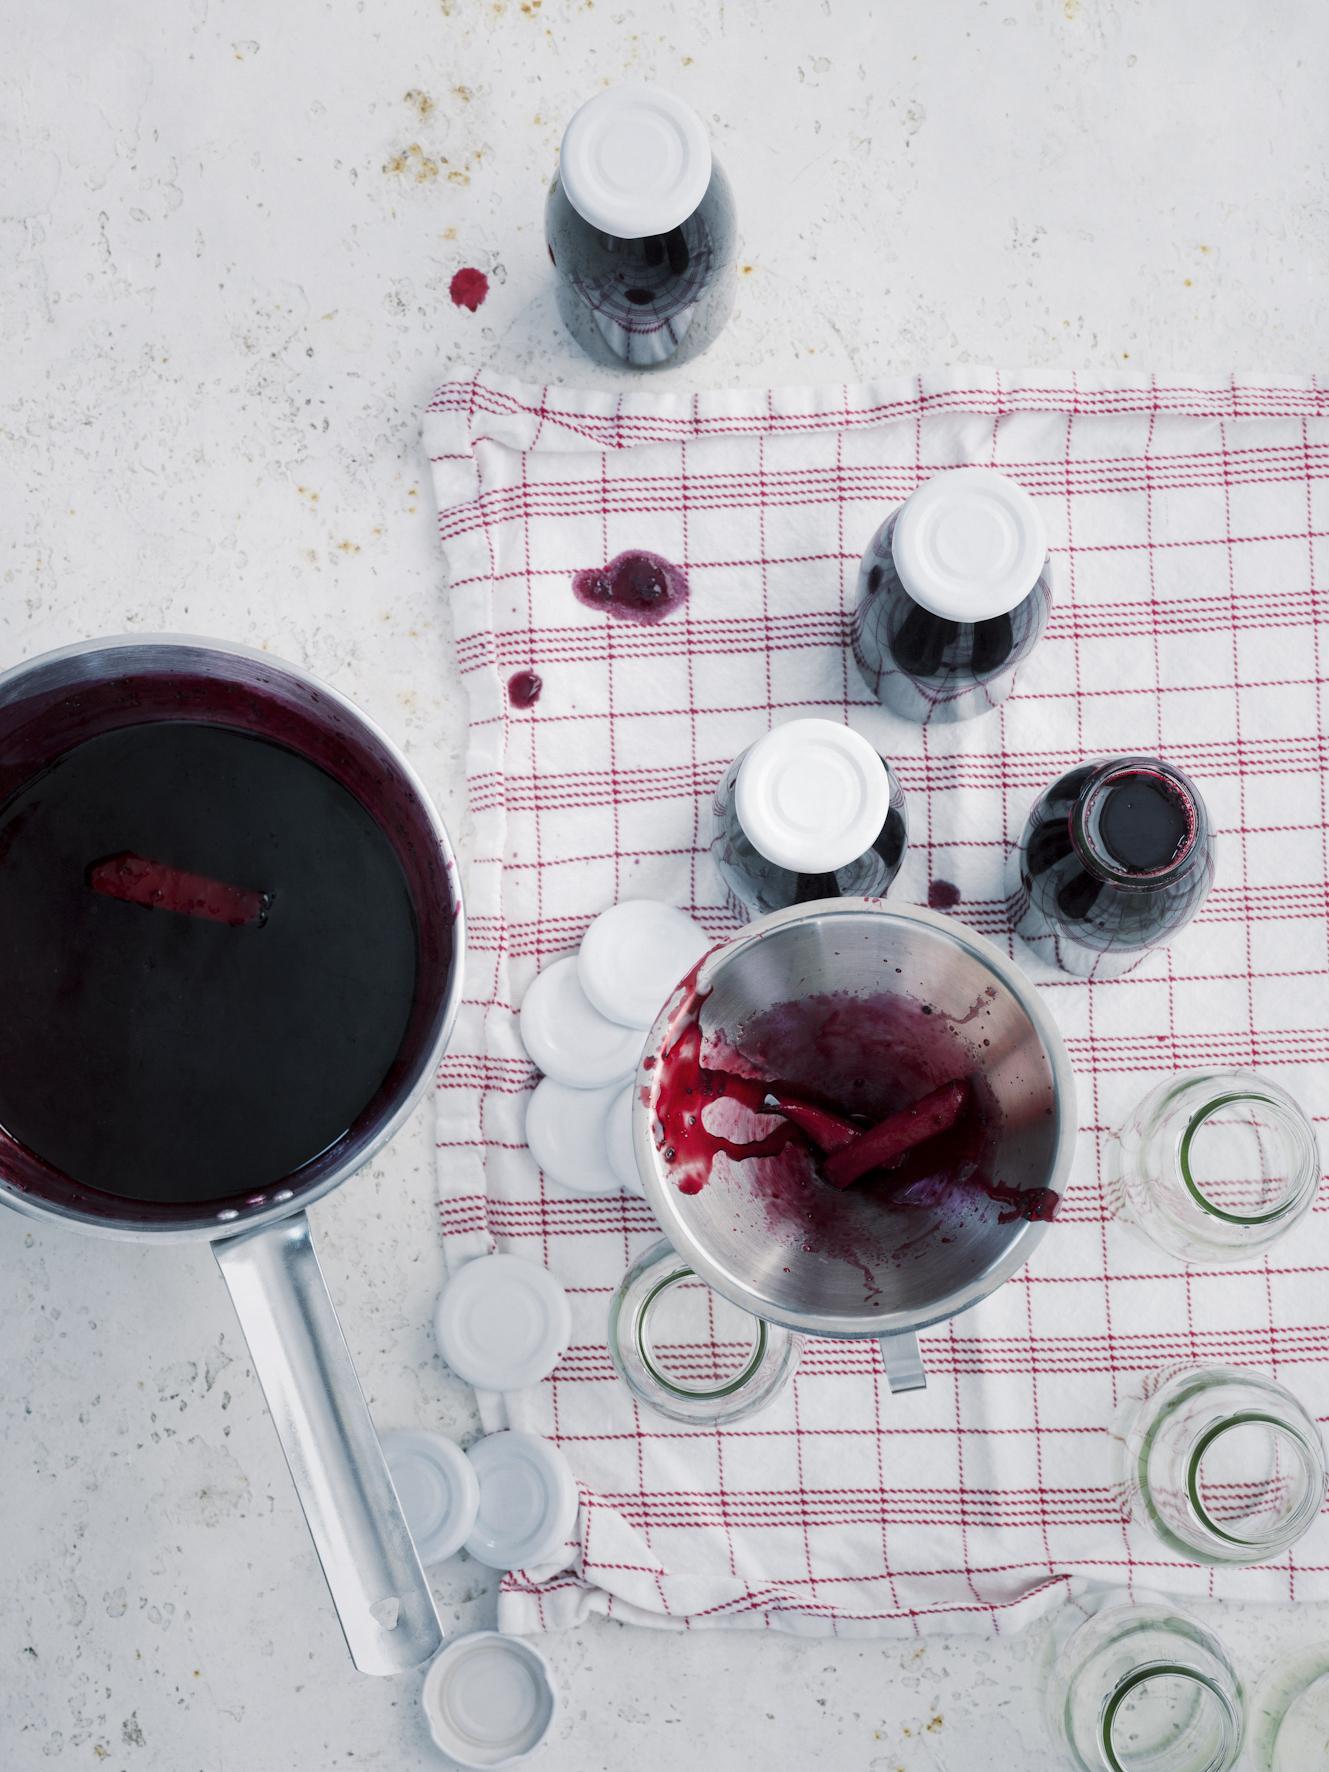 Kühle Erfrischung | Schwarzer Johannisbeer Sirup Rezept | Callwey Blog